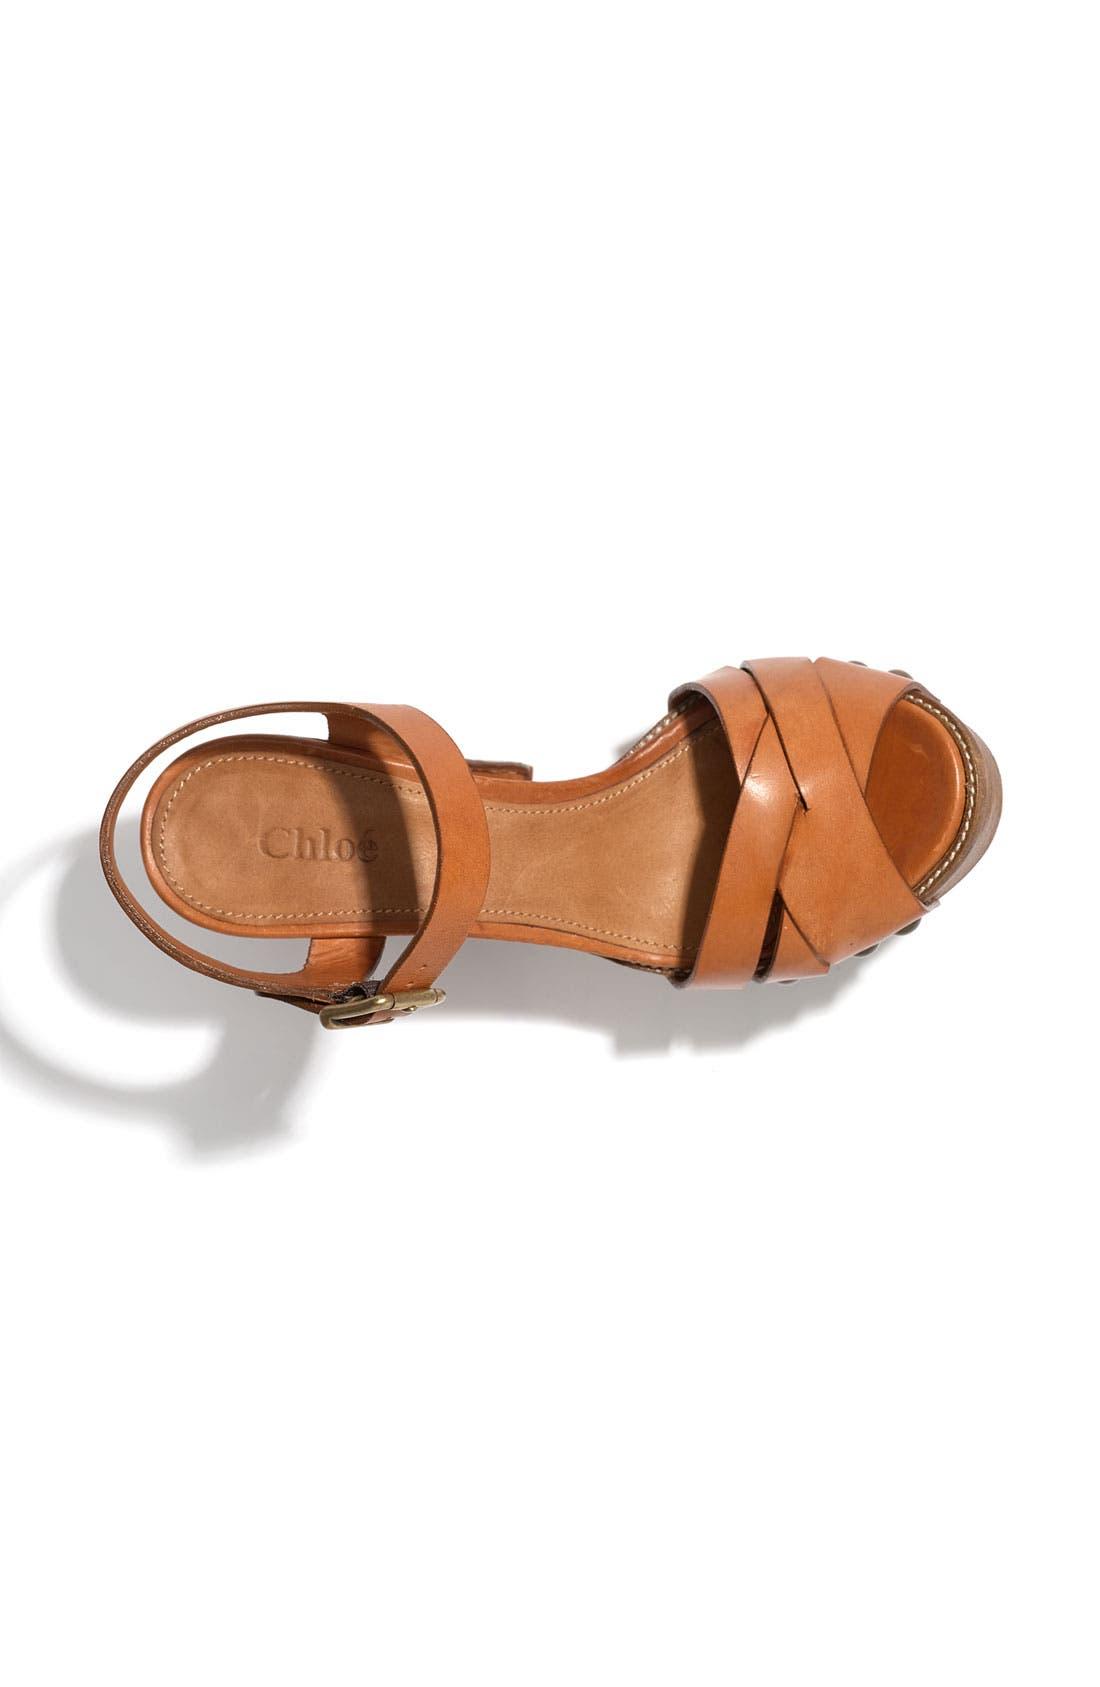 Alternate Image 3  - Chloé Platform Sandal